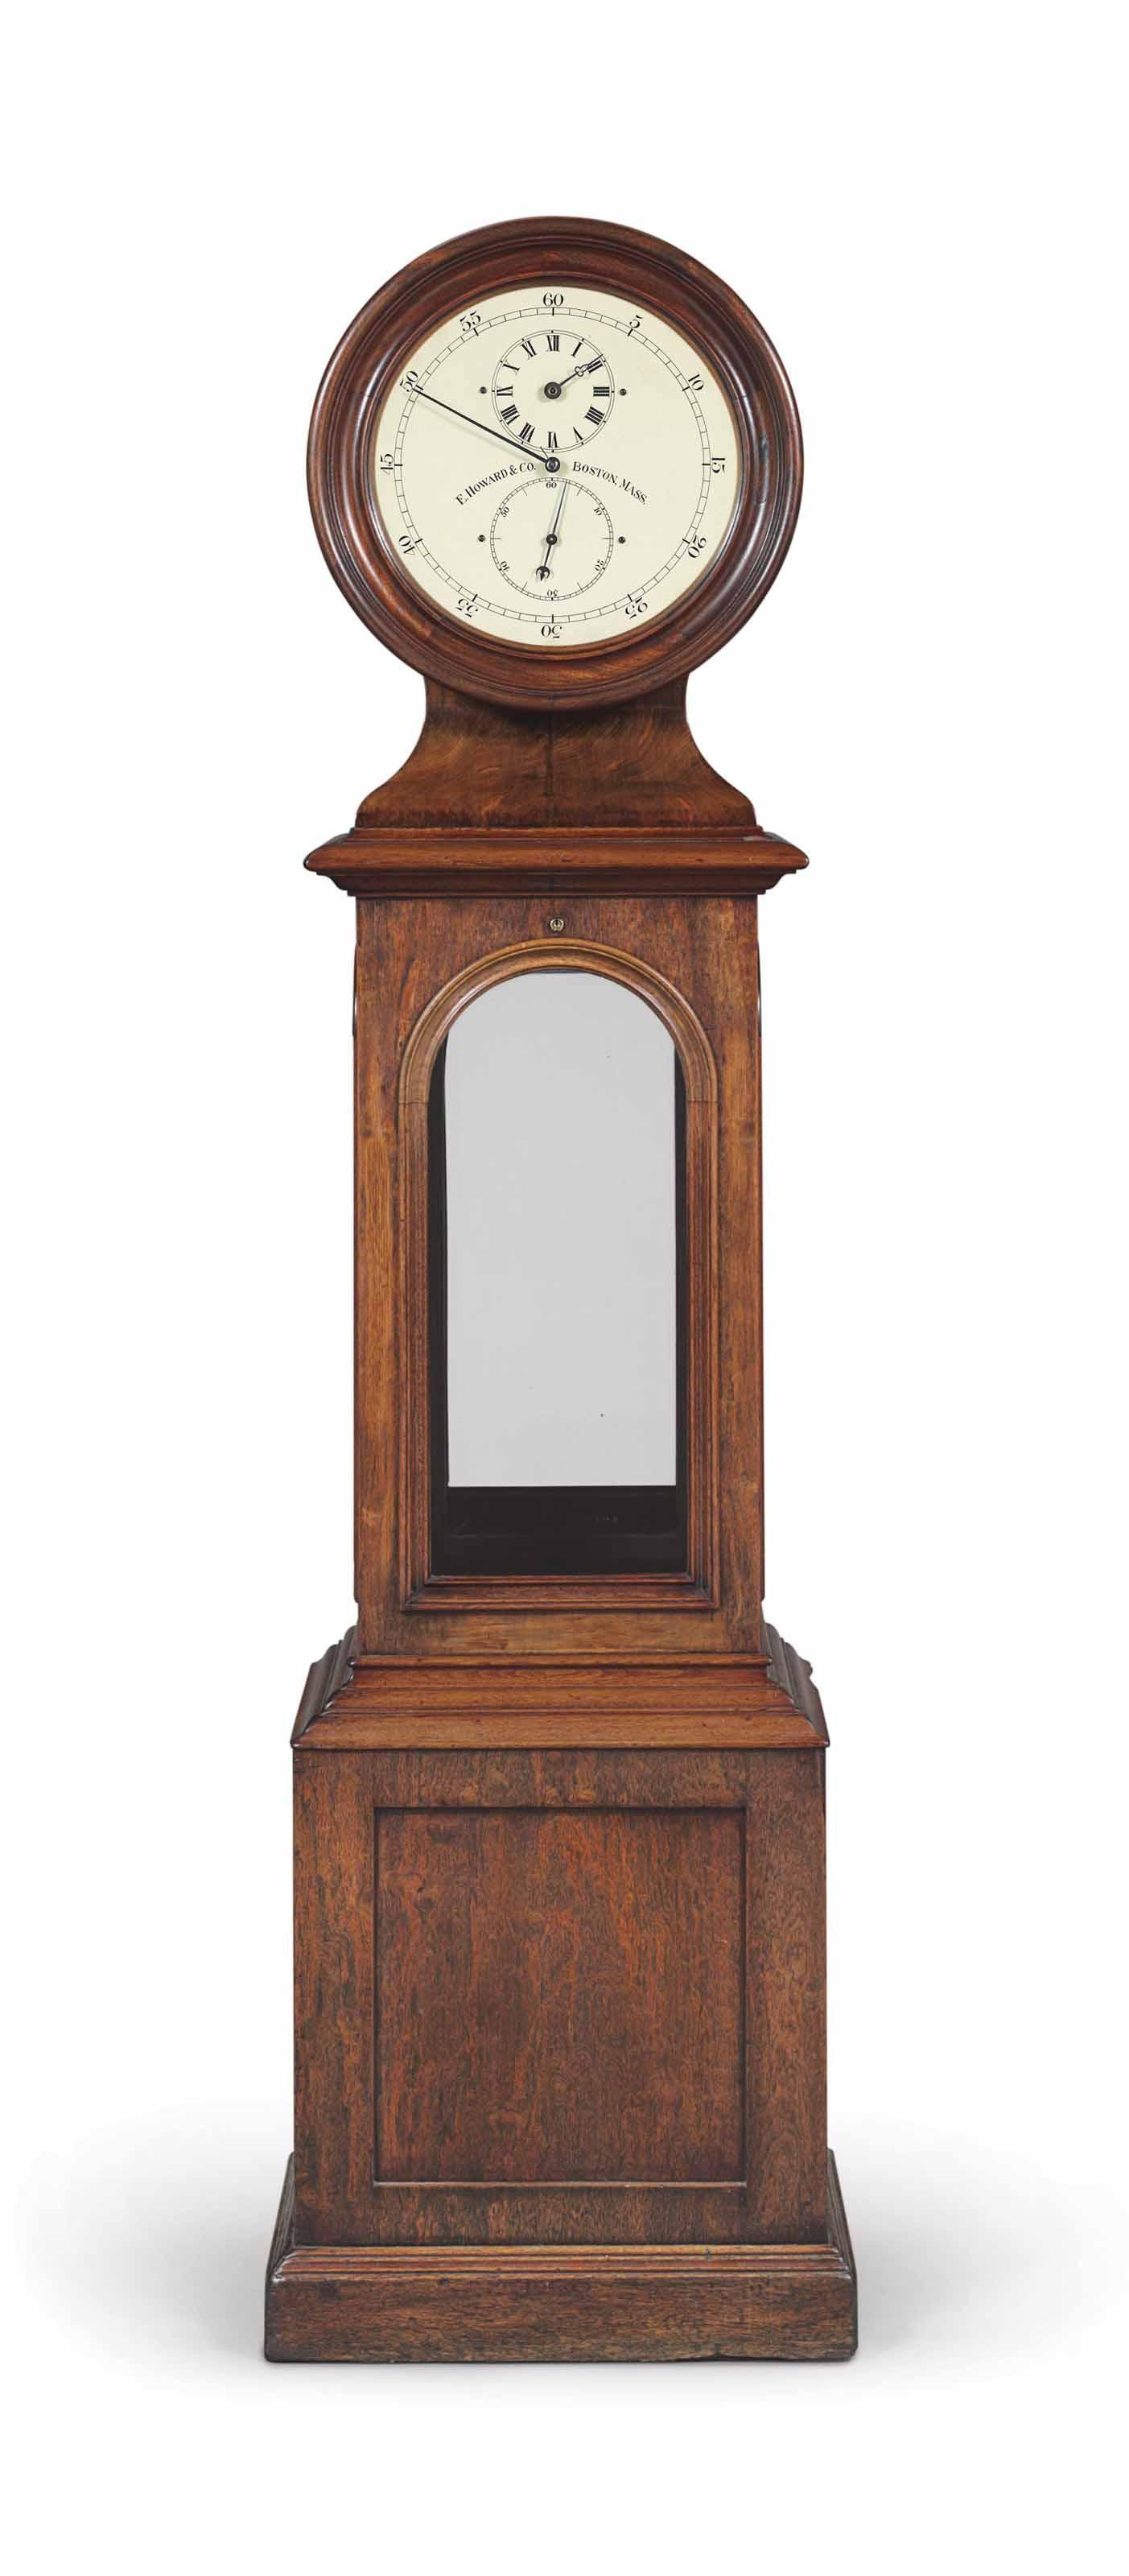 An Astronomical Regulator Floor Clock